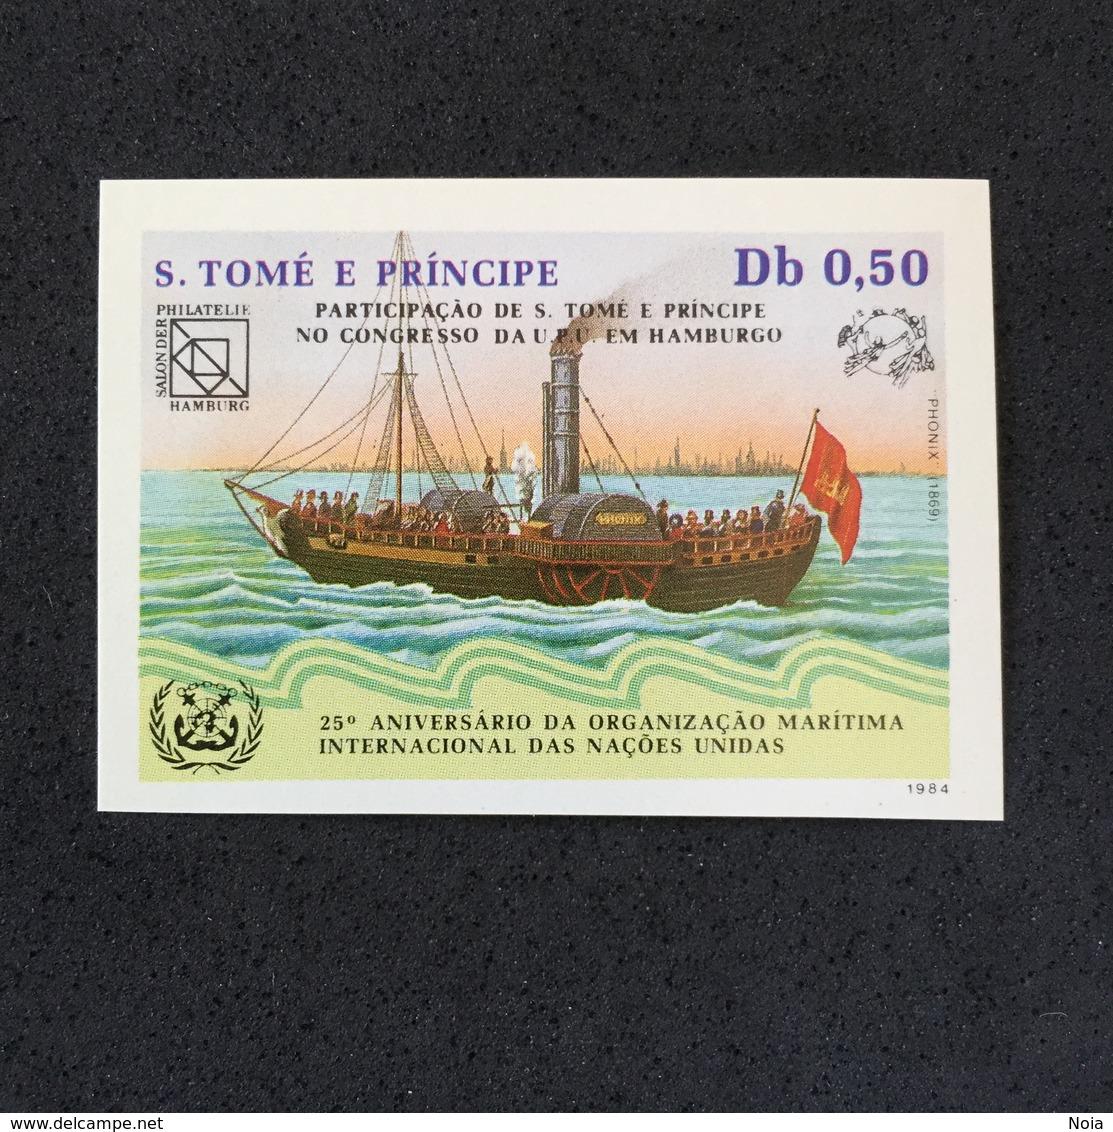 S TOMÉ E PRÍNCIPE. SHIPS. MNH. D2904B - Barcos